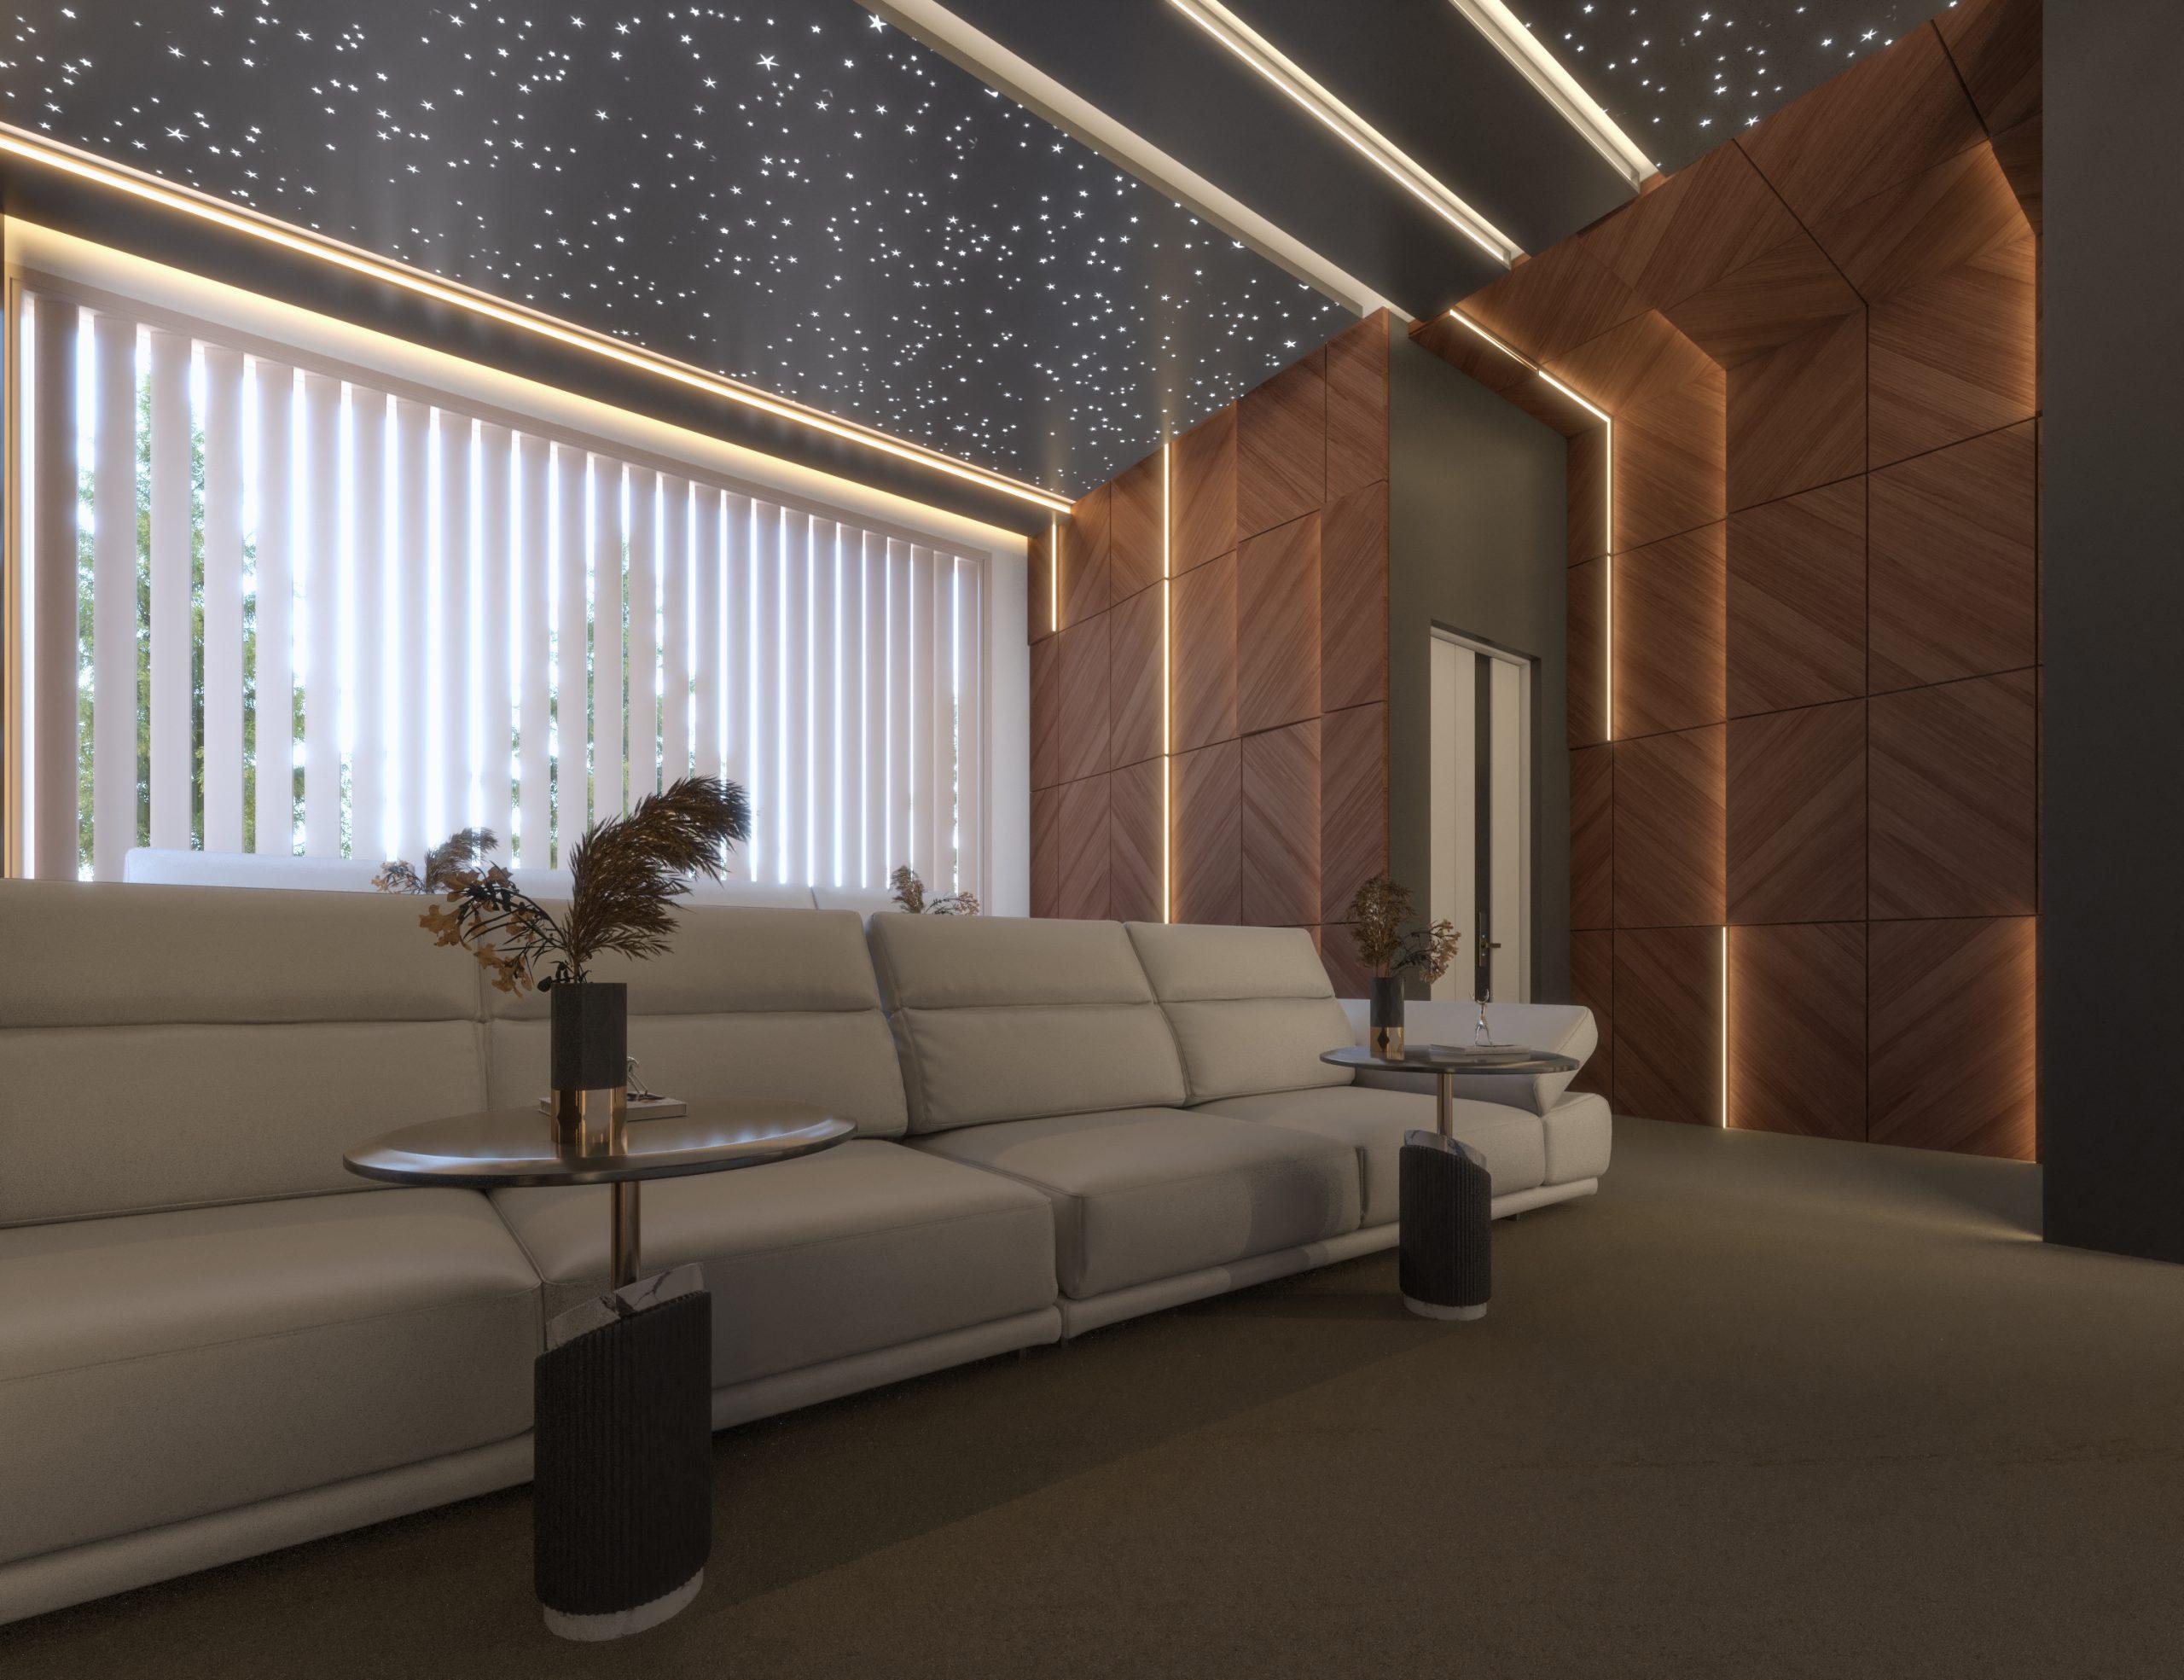 furniture - cinema - design - sofa